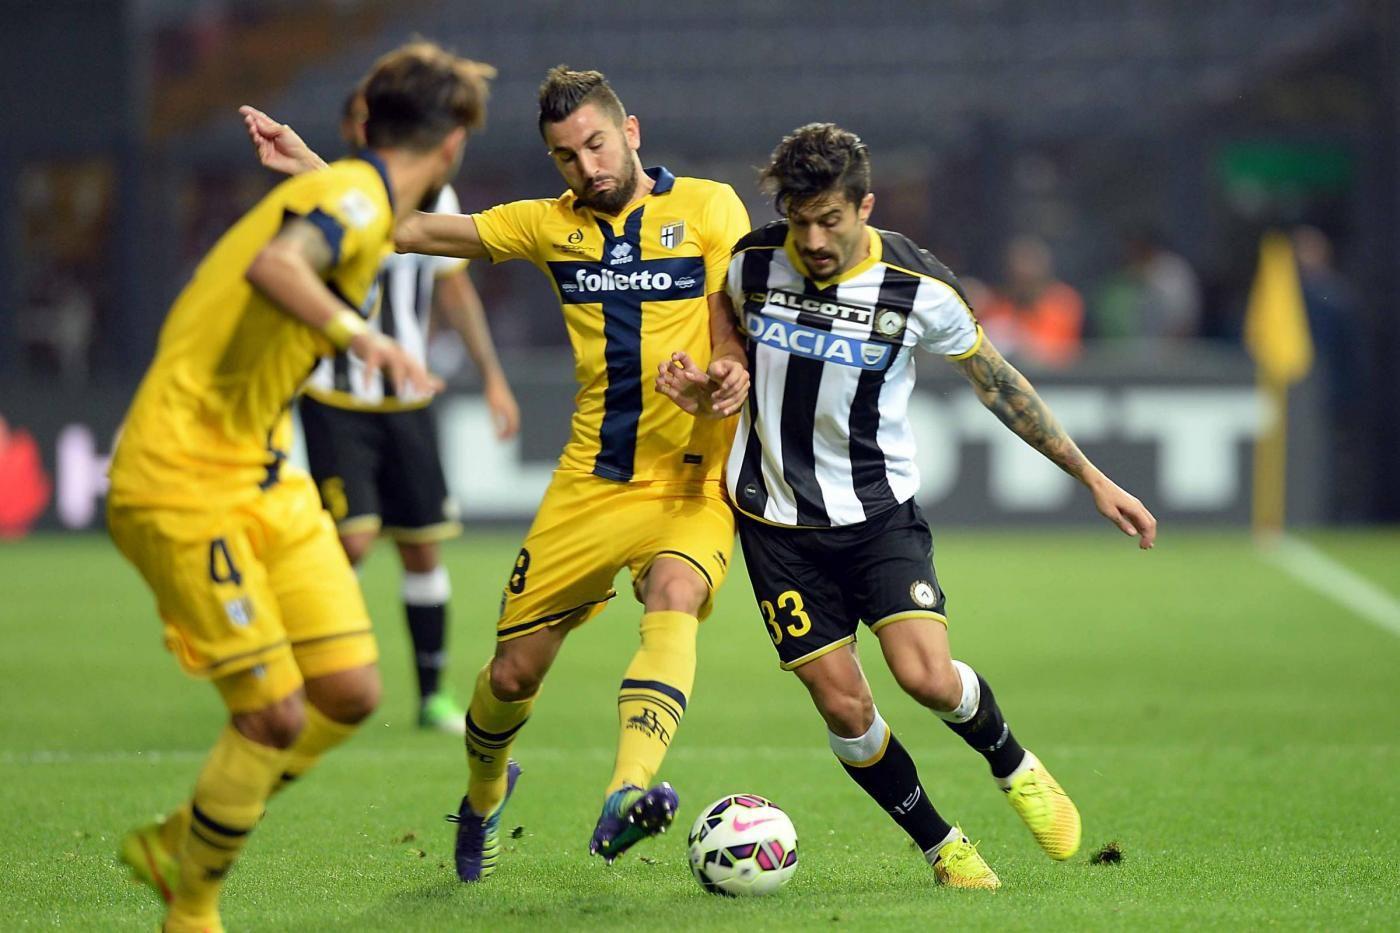 Udinese vs Parma - Serie A Tim 2014/2015